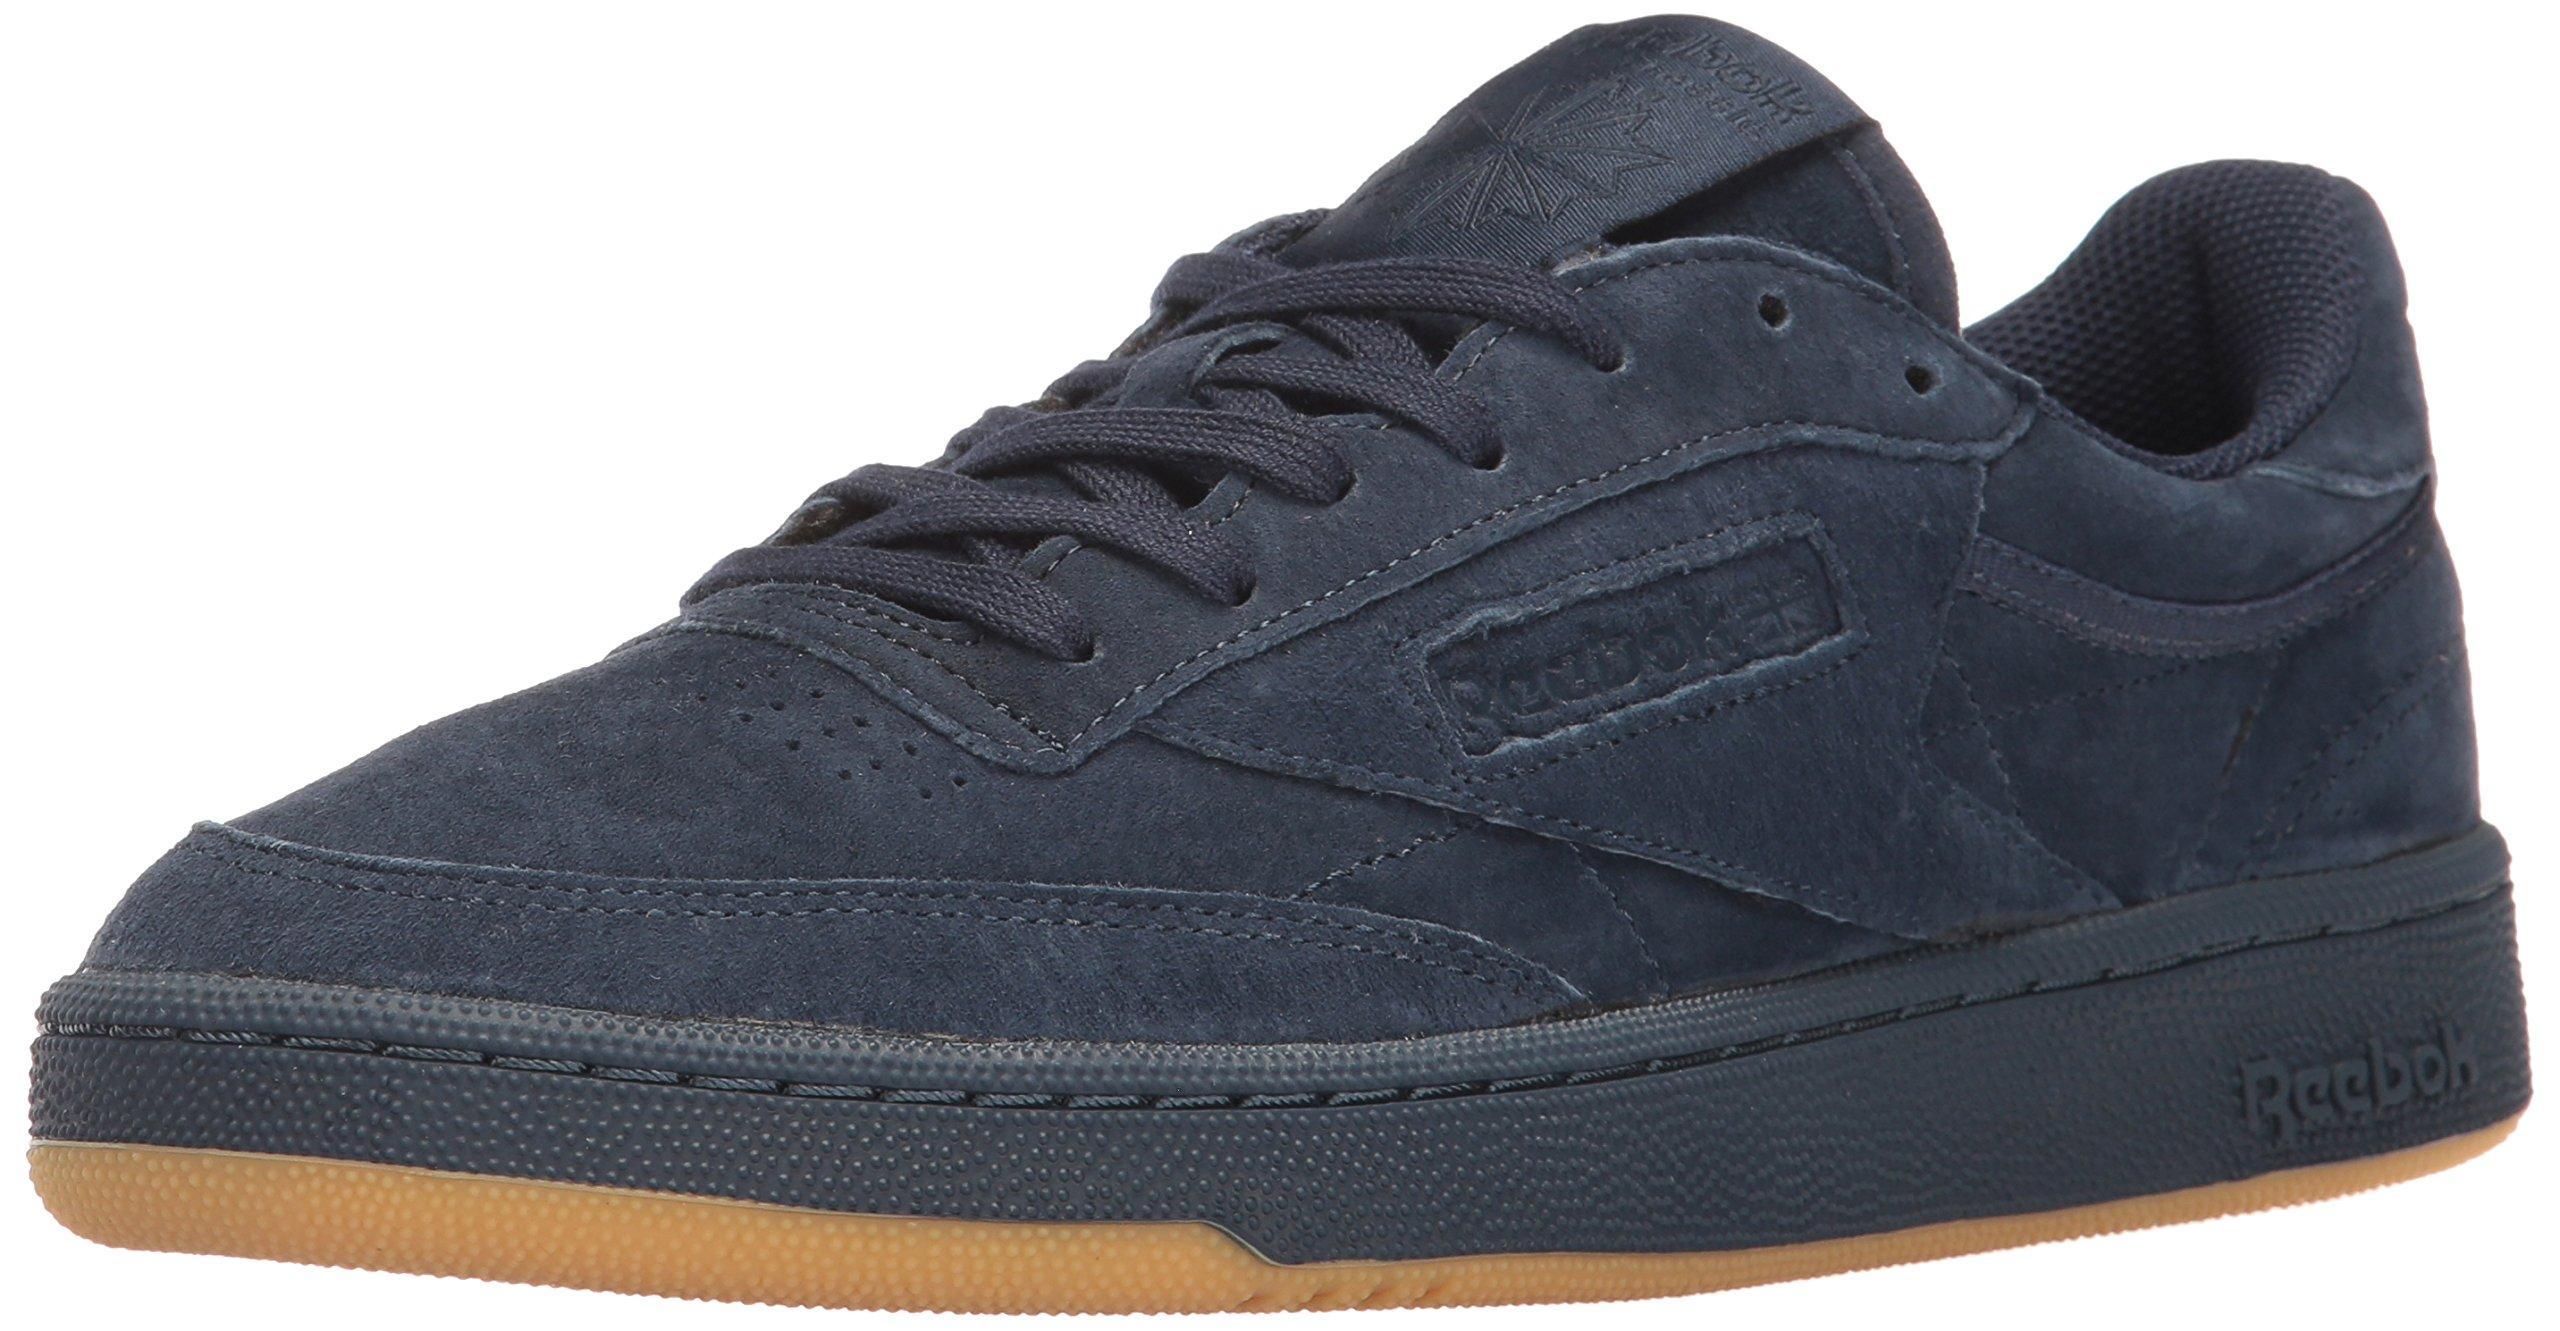 021c442d0bf Galleon - Reebok Men s Club C 85 TG Fashion Sneaker